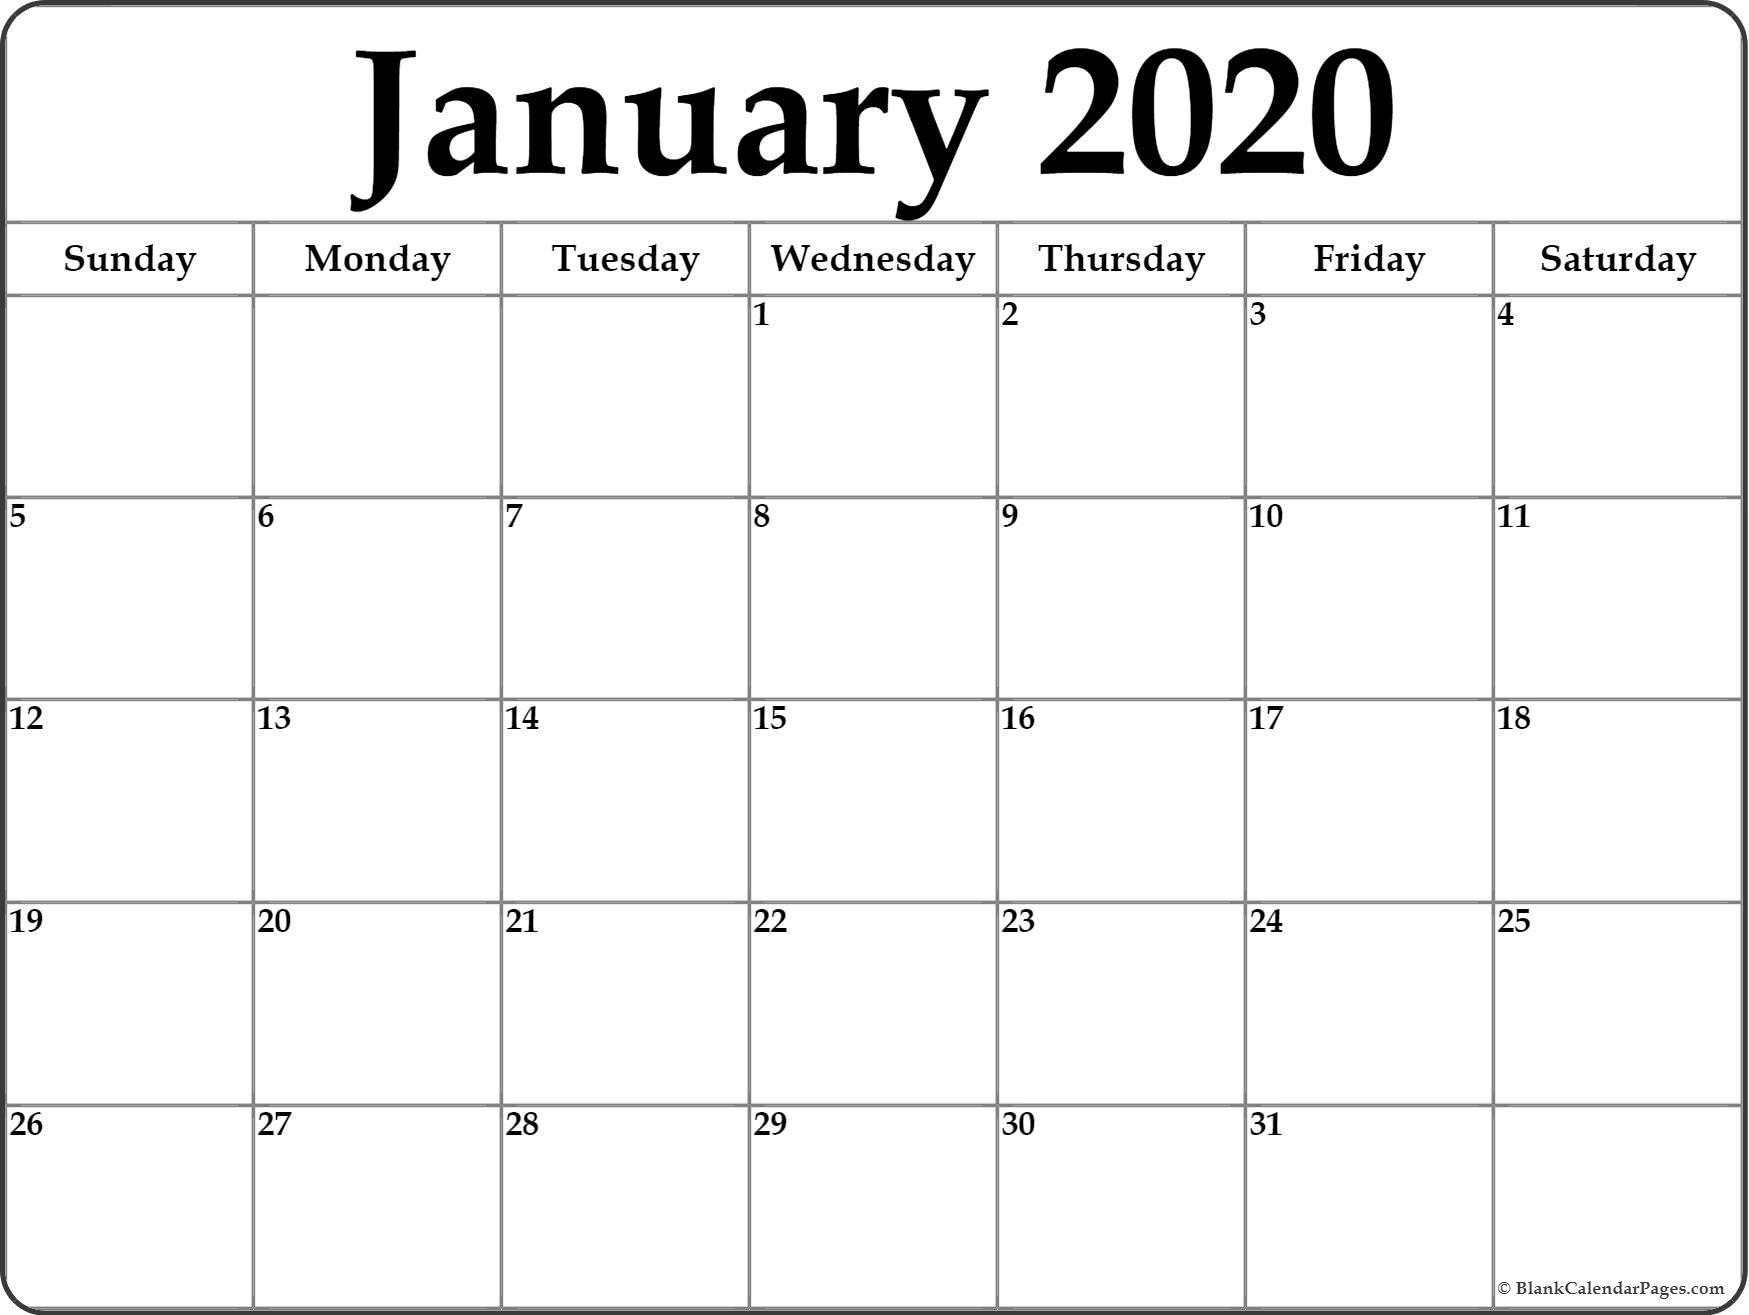 January 2020 Calendar   Free Printable Monthly Calendars inside 2020 Imom Free Calendars To Print